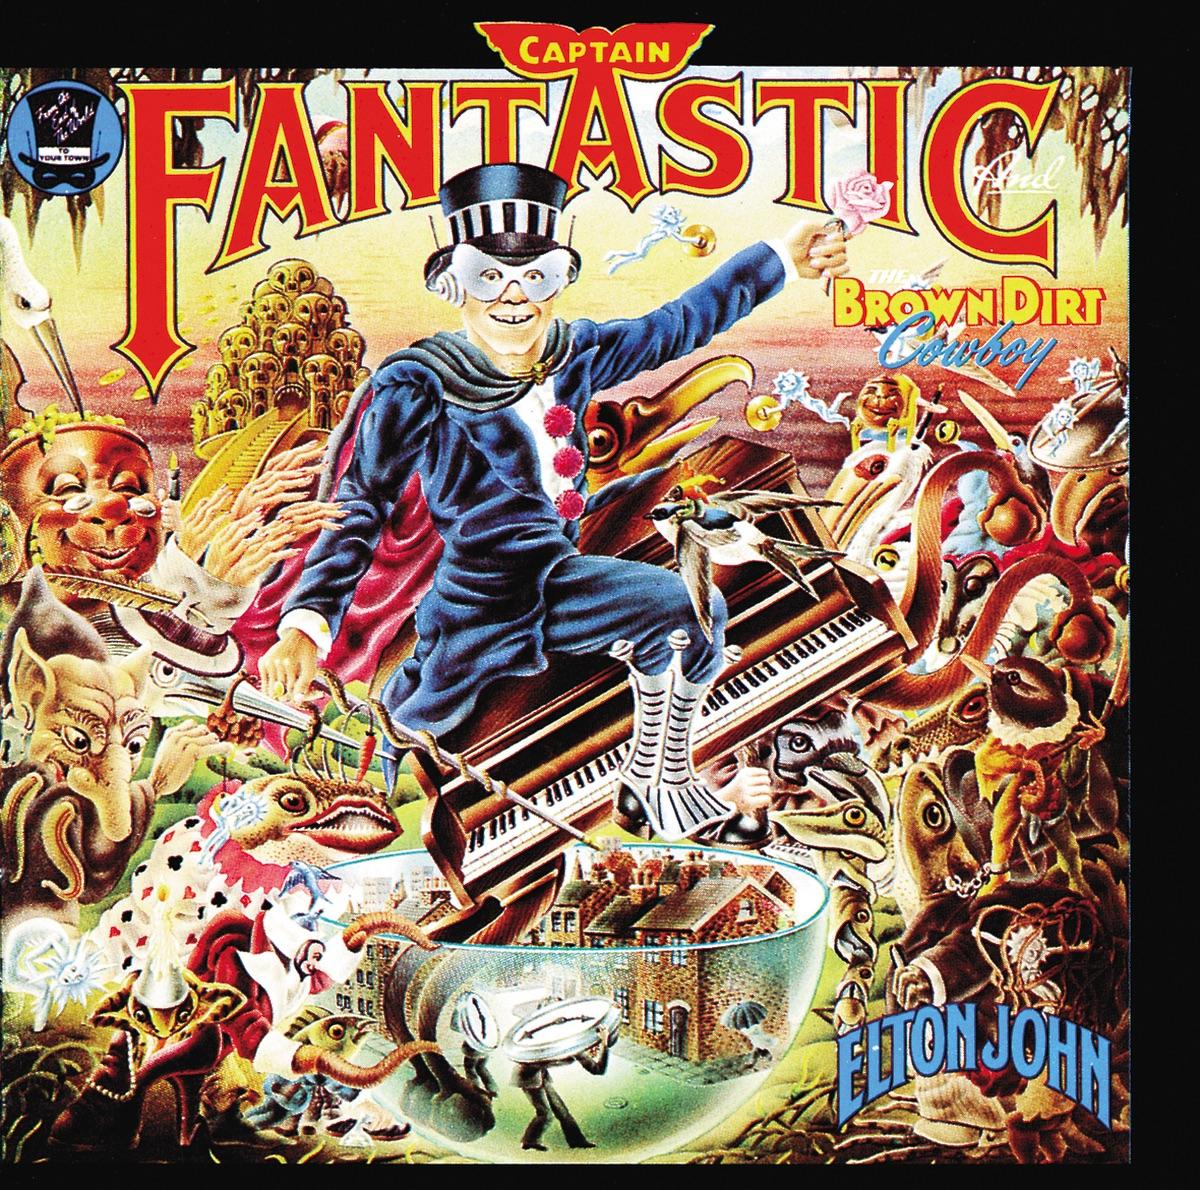 Captain Fantastic and the Brown Dirt Cowboy Elton John CD cover